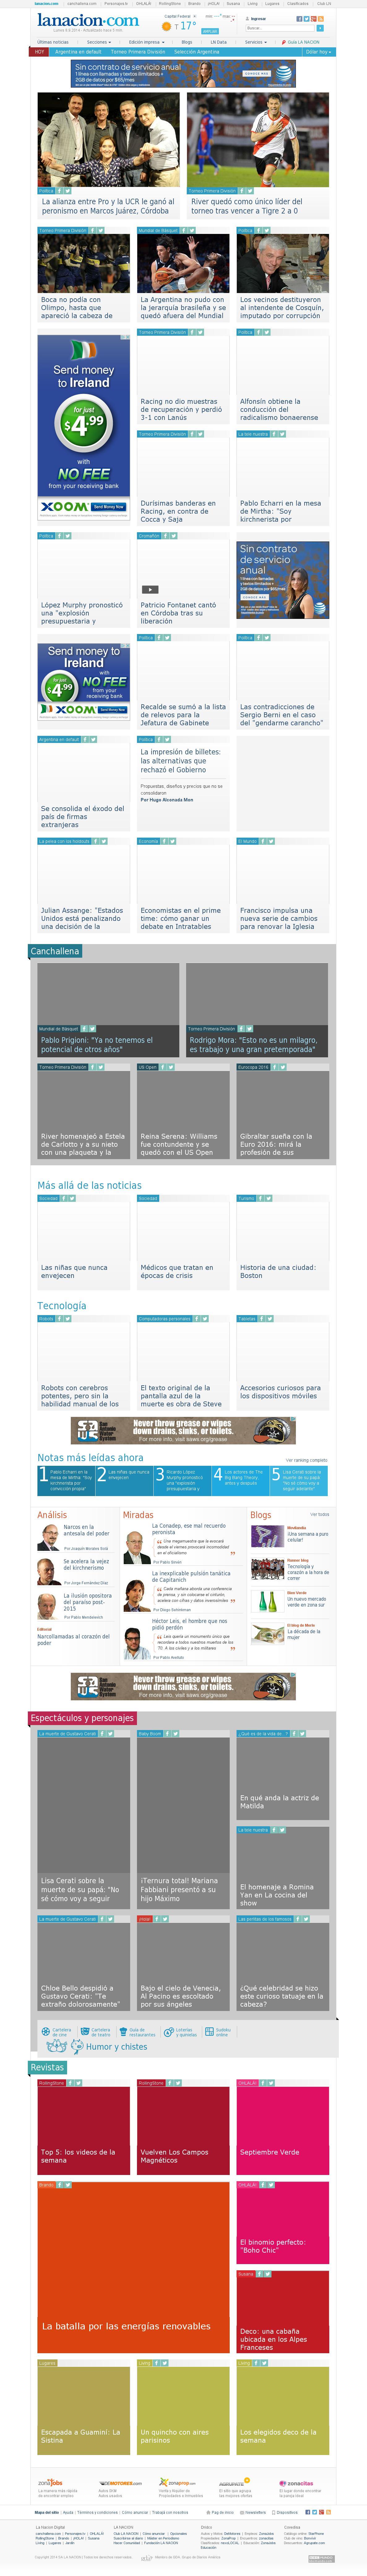 lanacion.com at Monday Sept. 8, 2014, 5:10 a.m. UTC